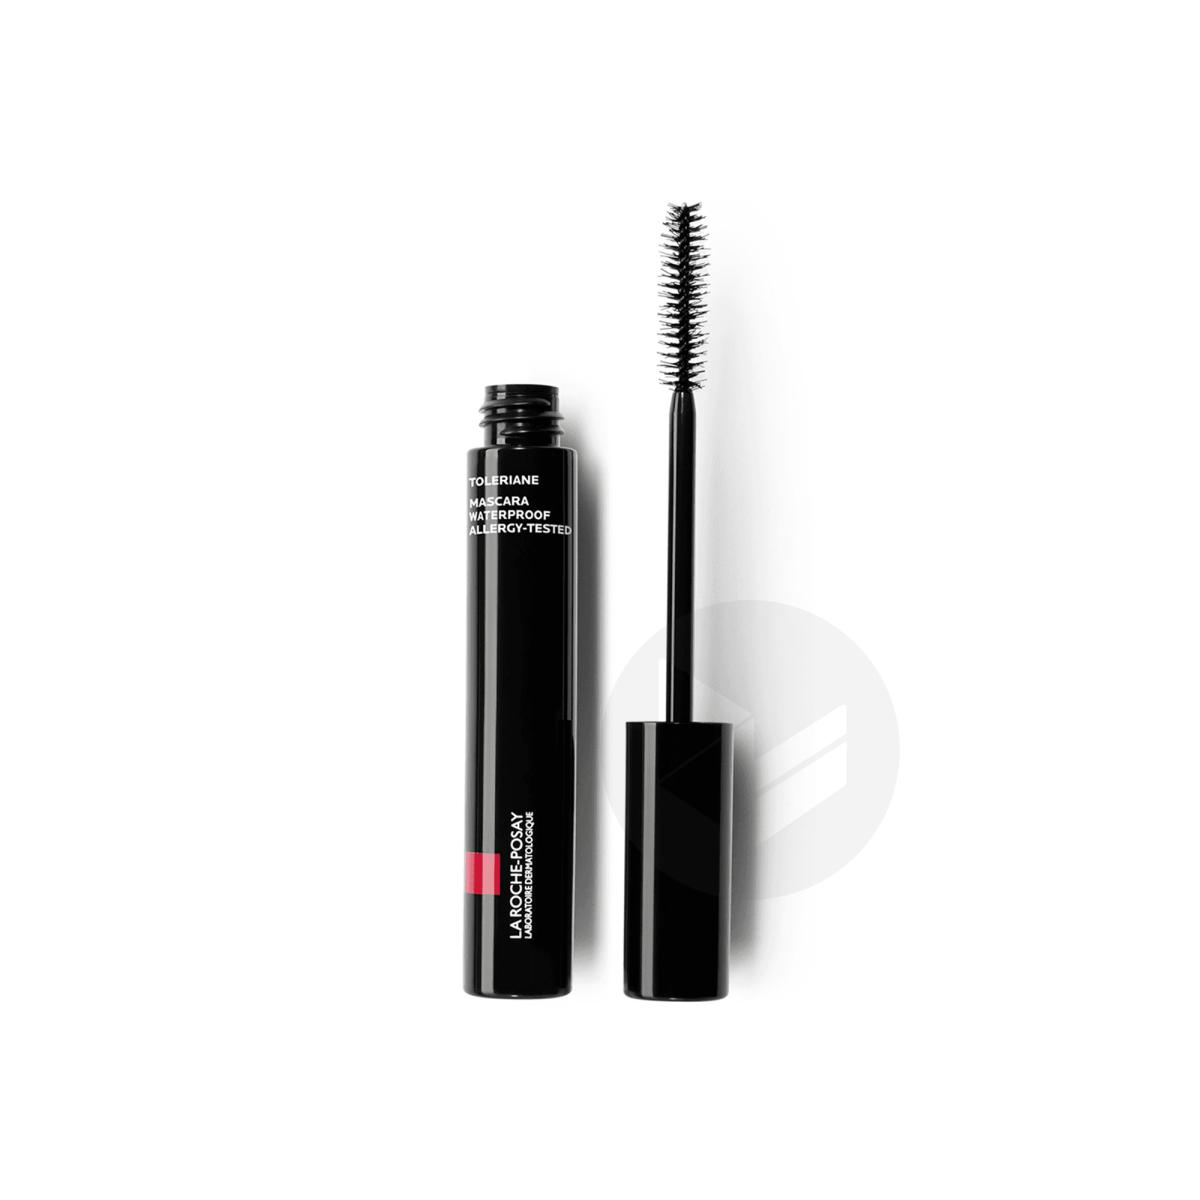 Toleriane Mascara Waterproof noir